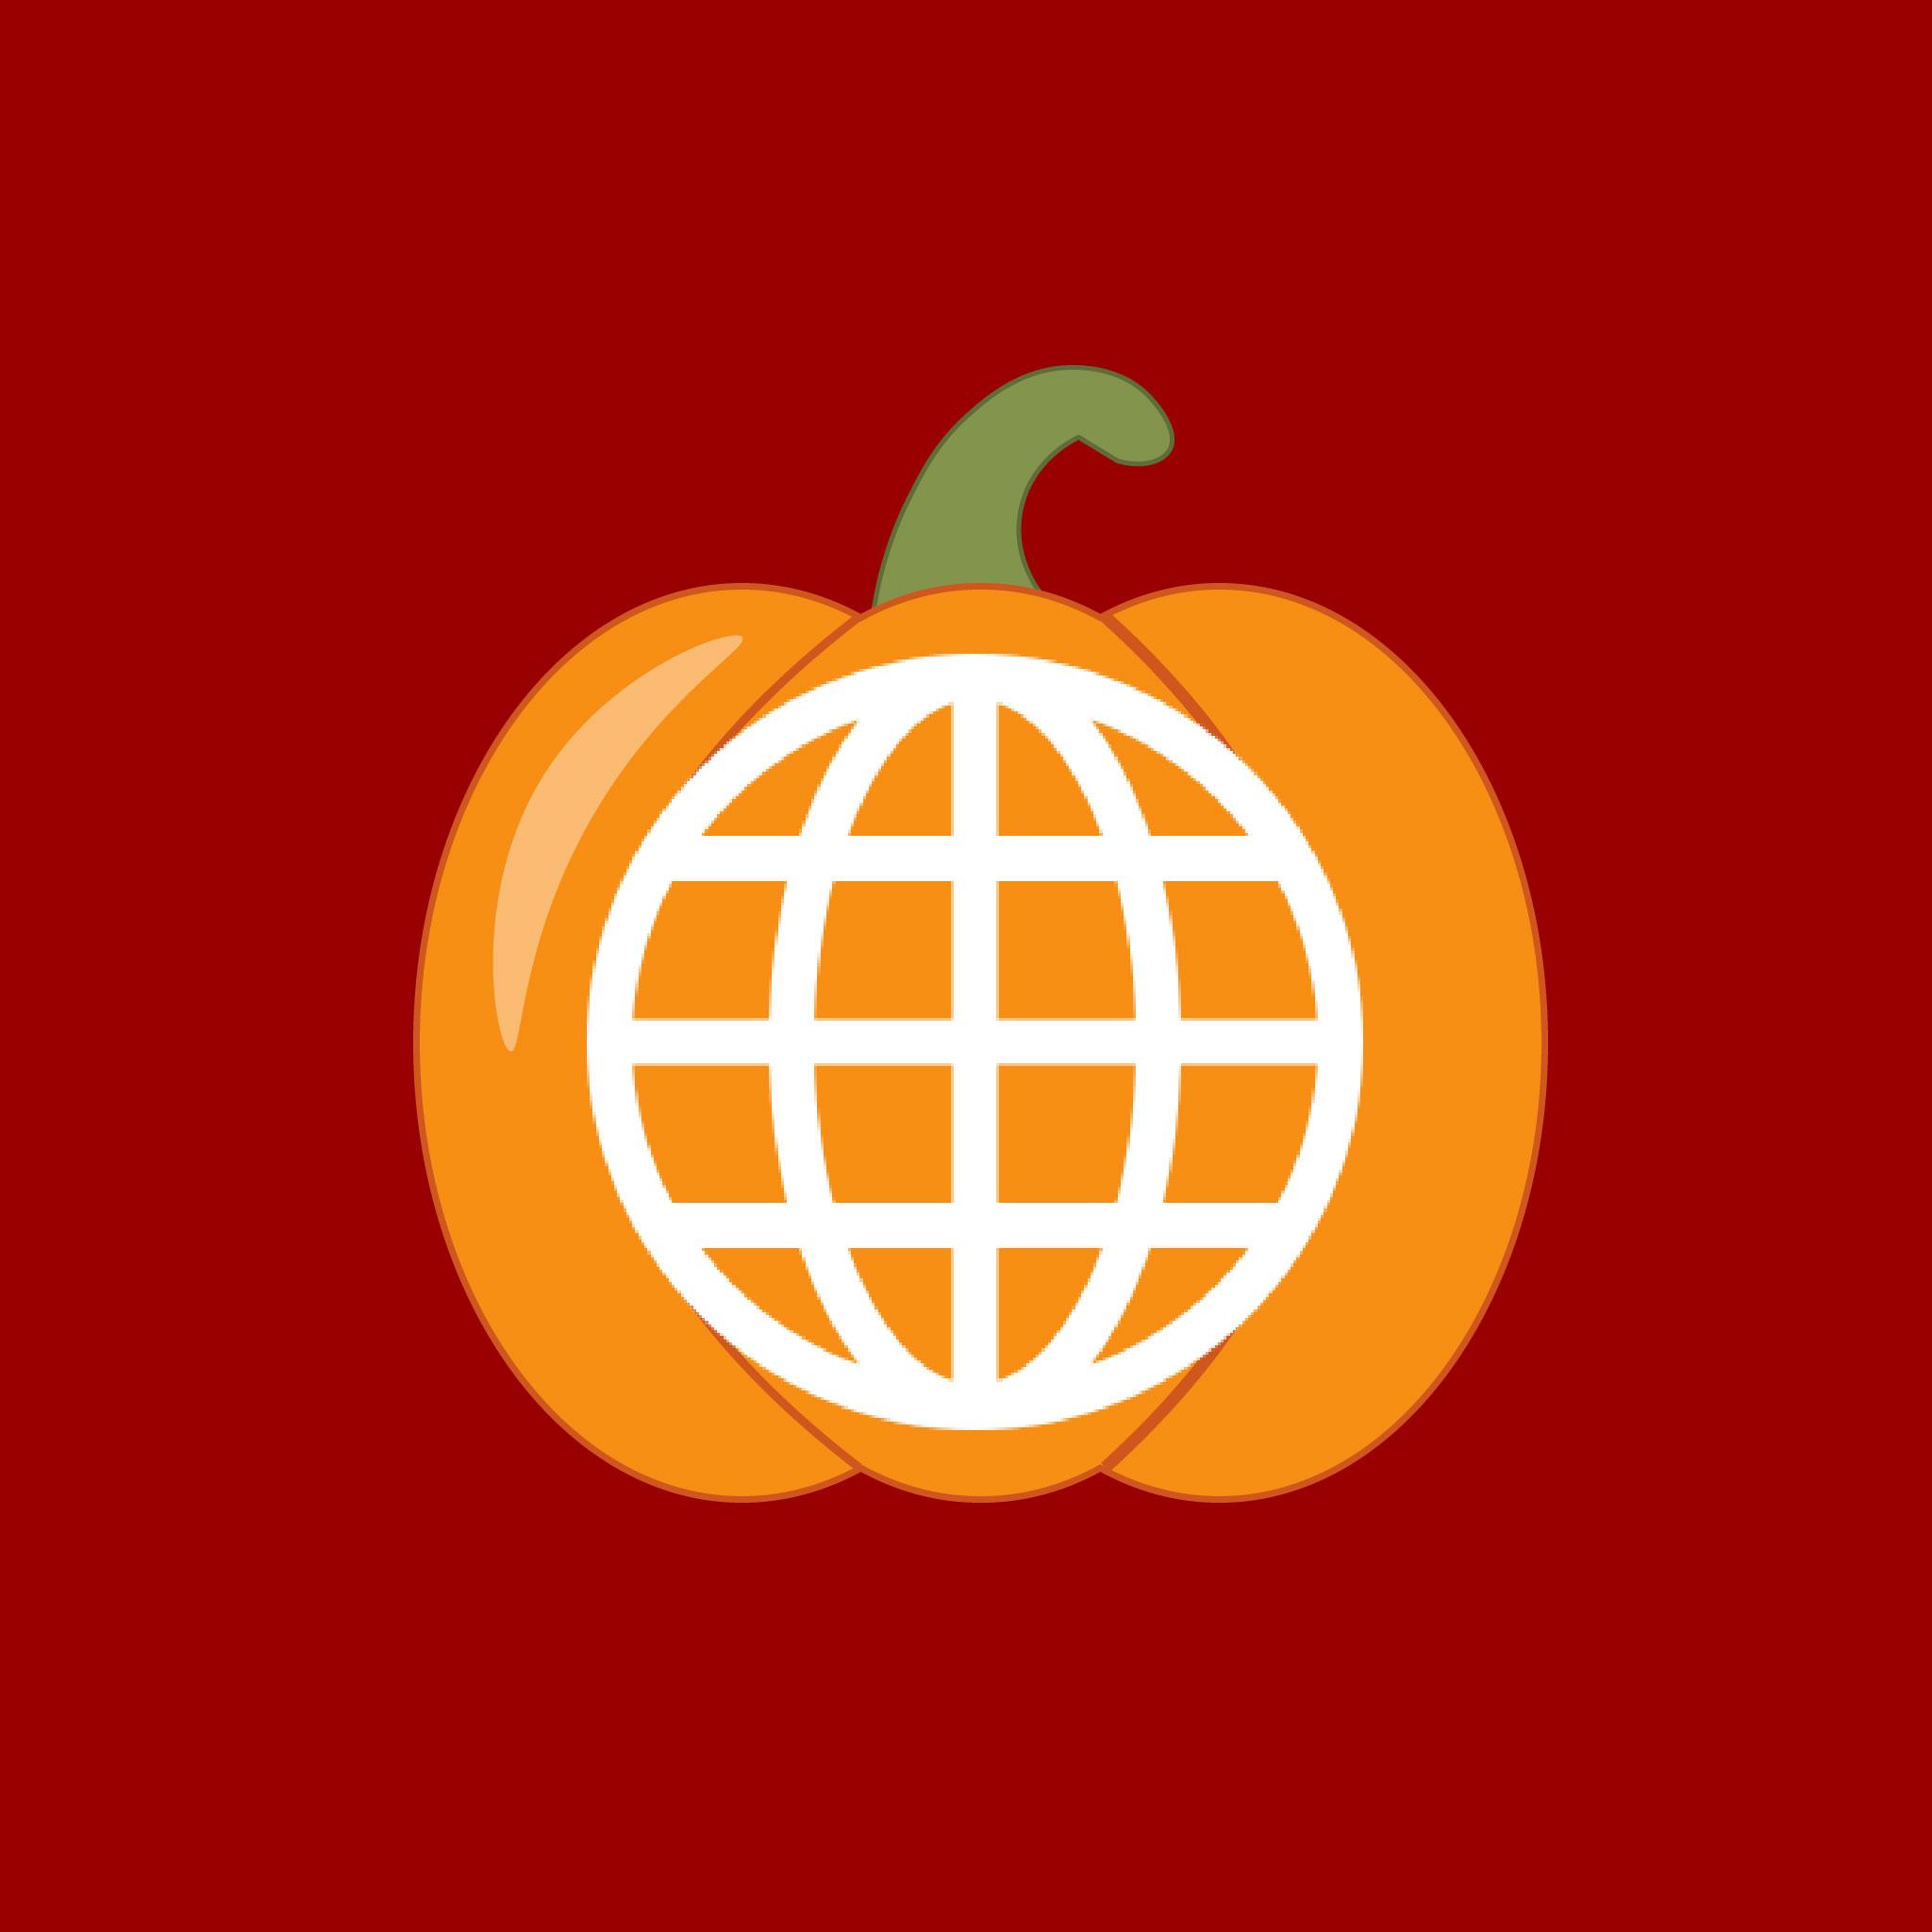 Internet Halloween App Icon from HalloweenCostumes.com